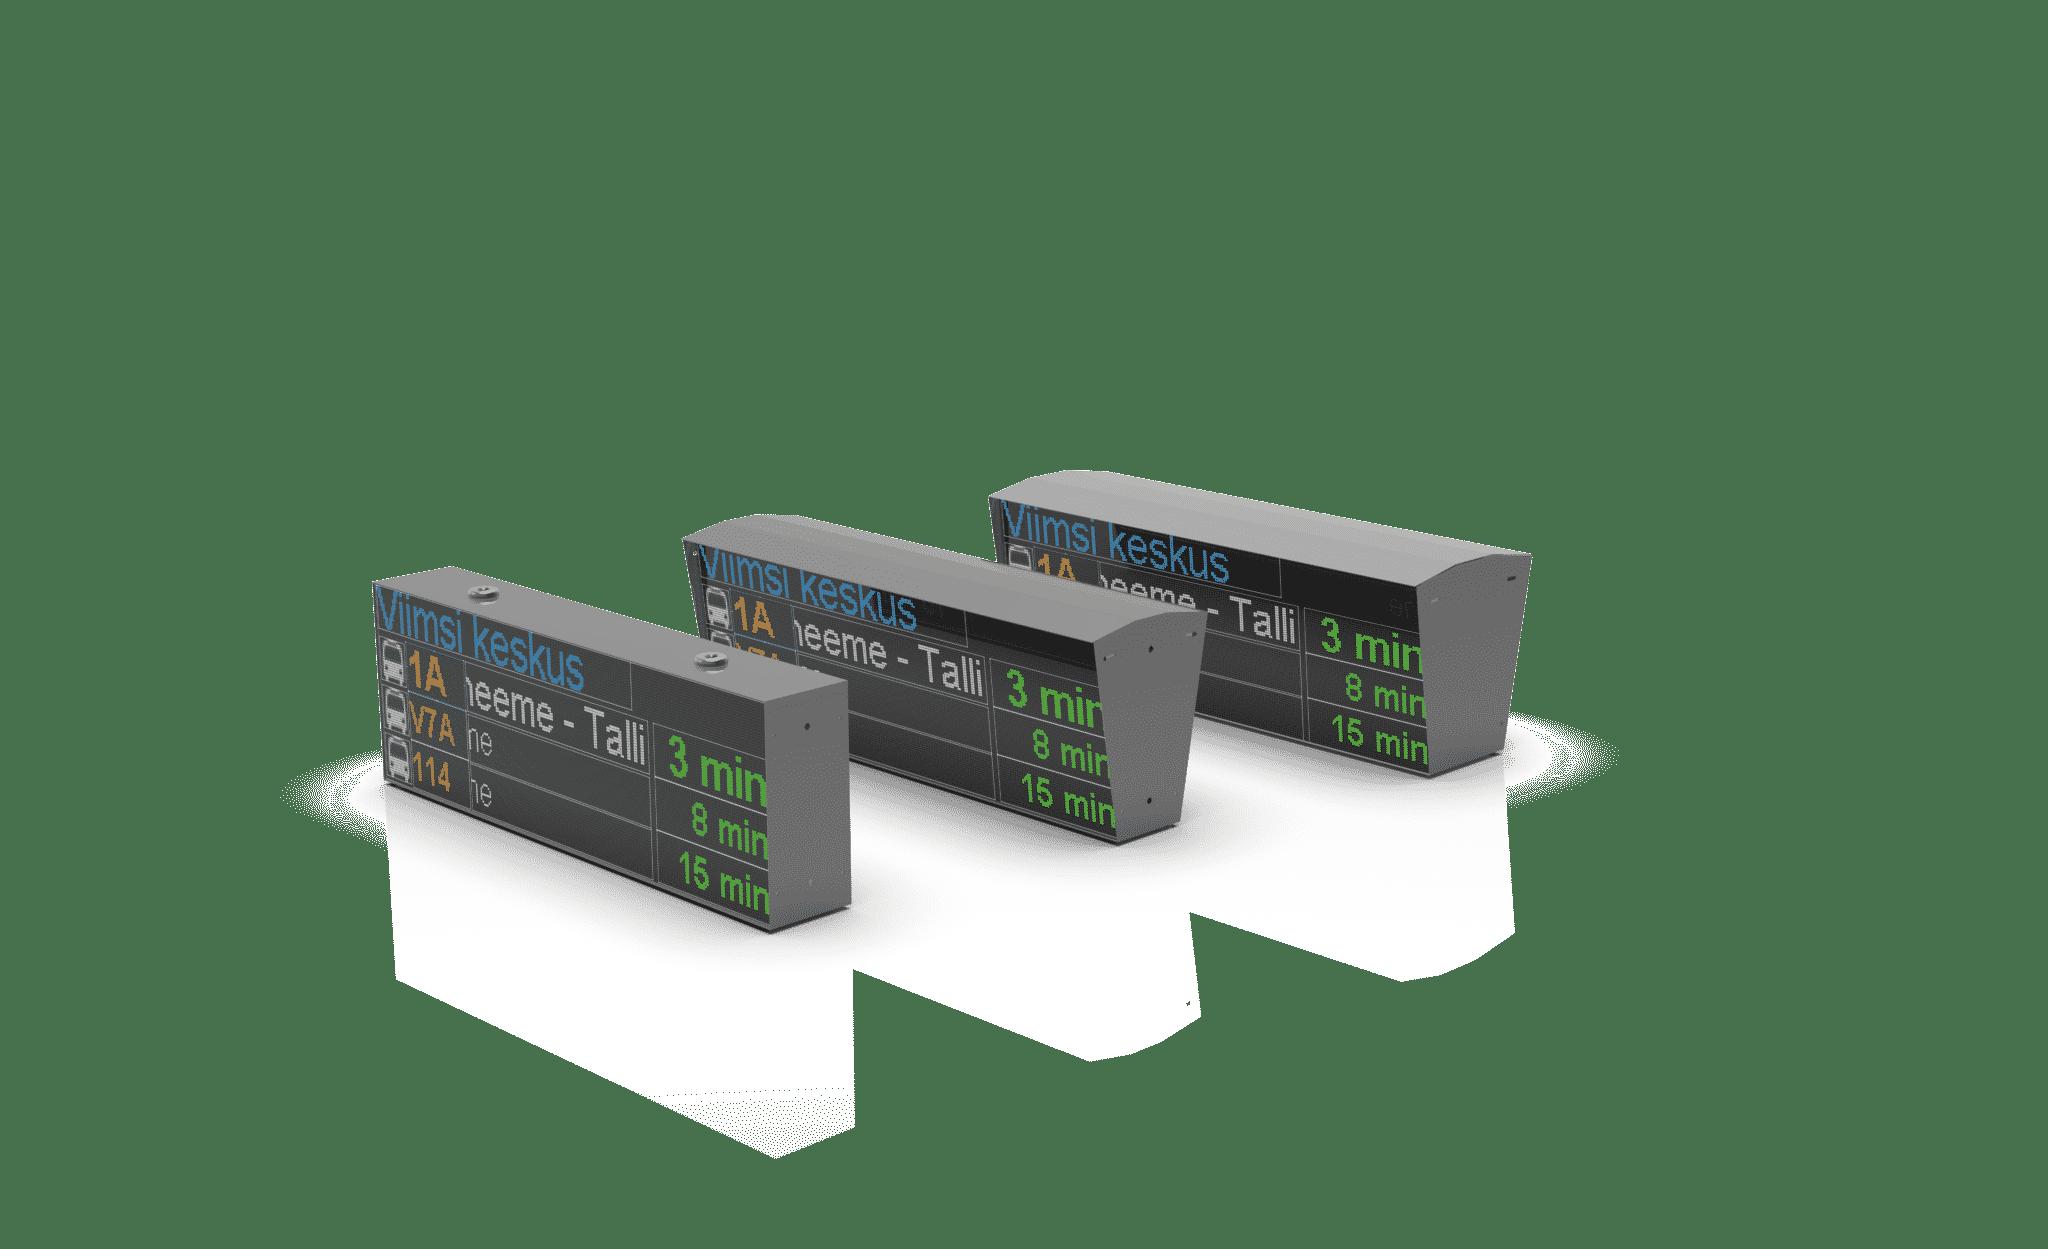 Double-sided_concept_v1.3_3-models